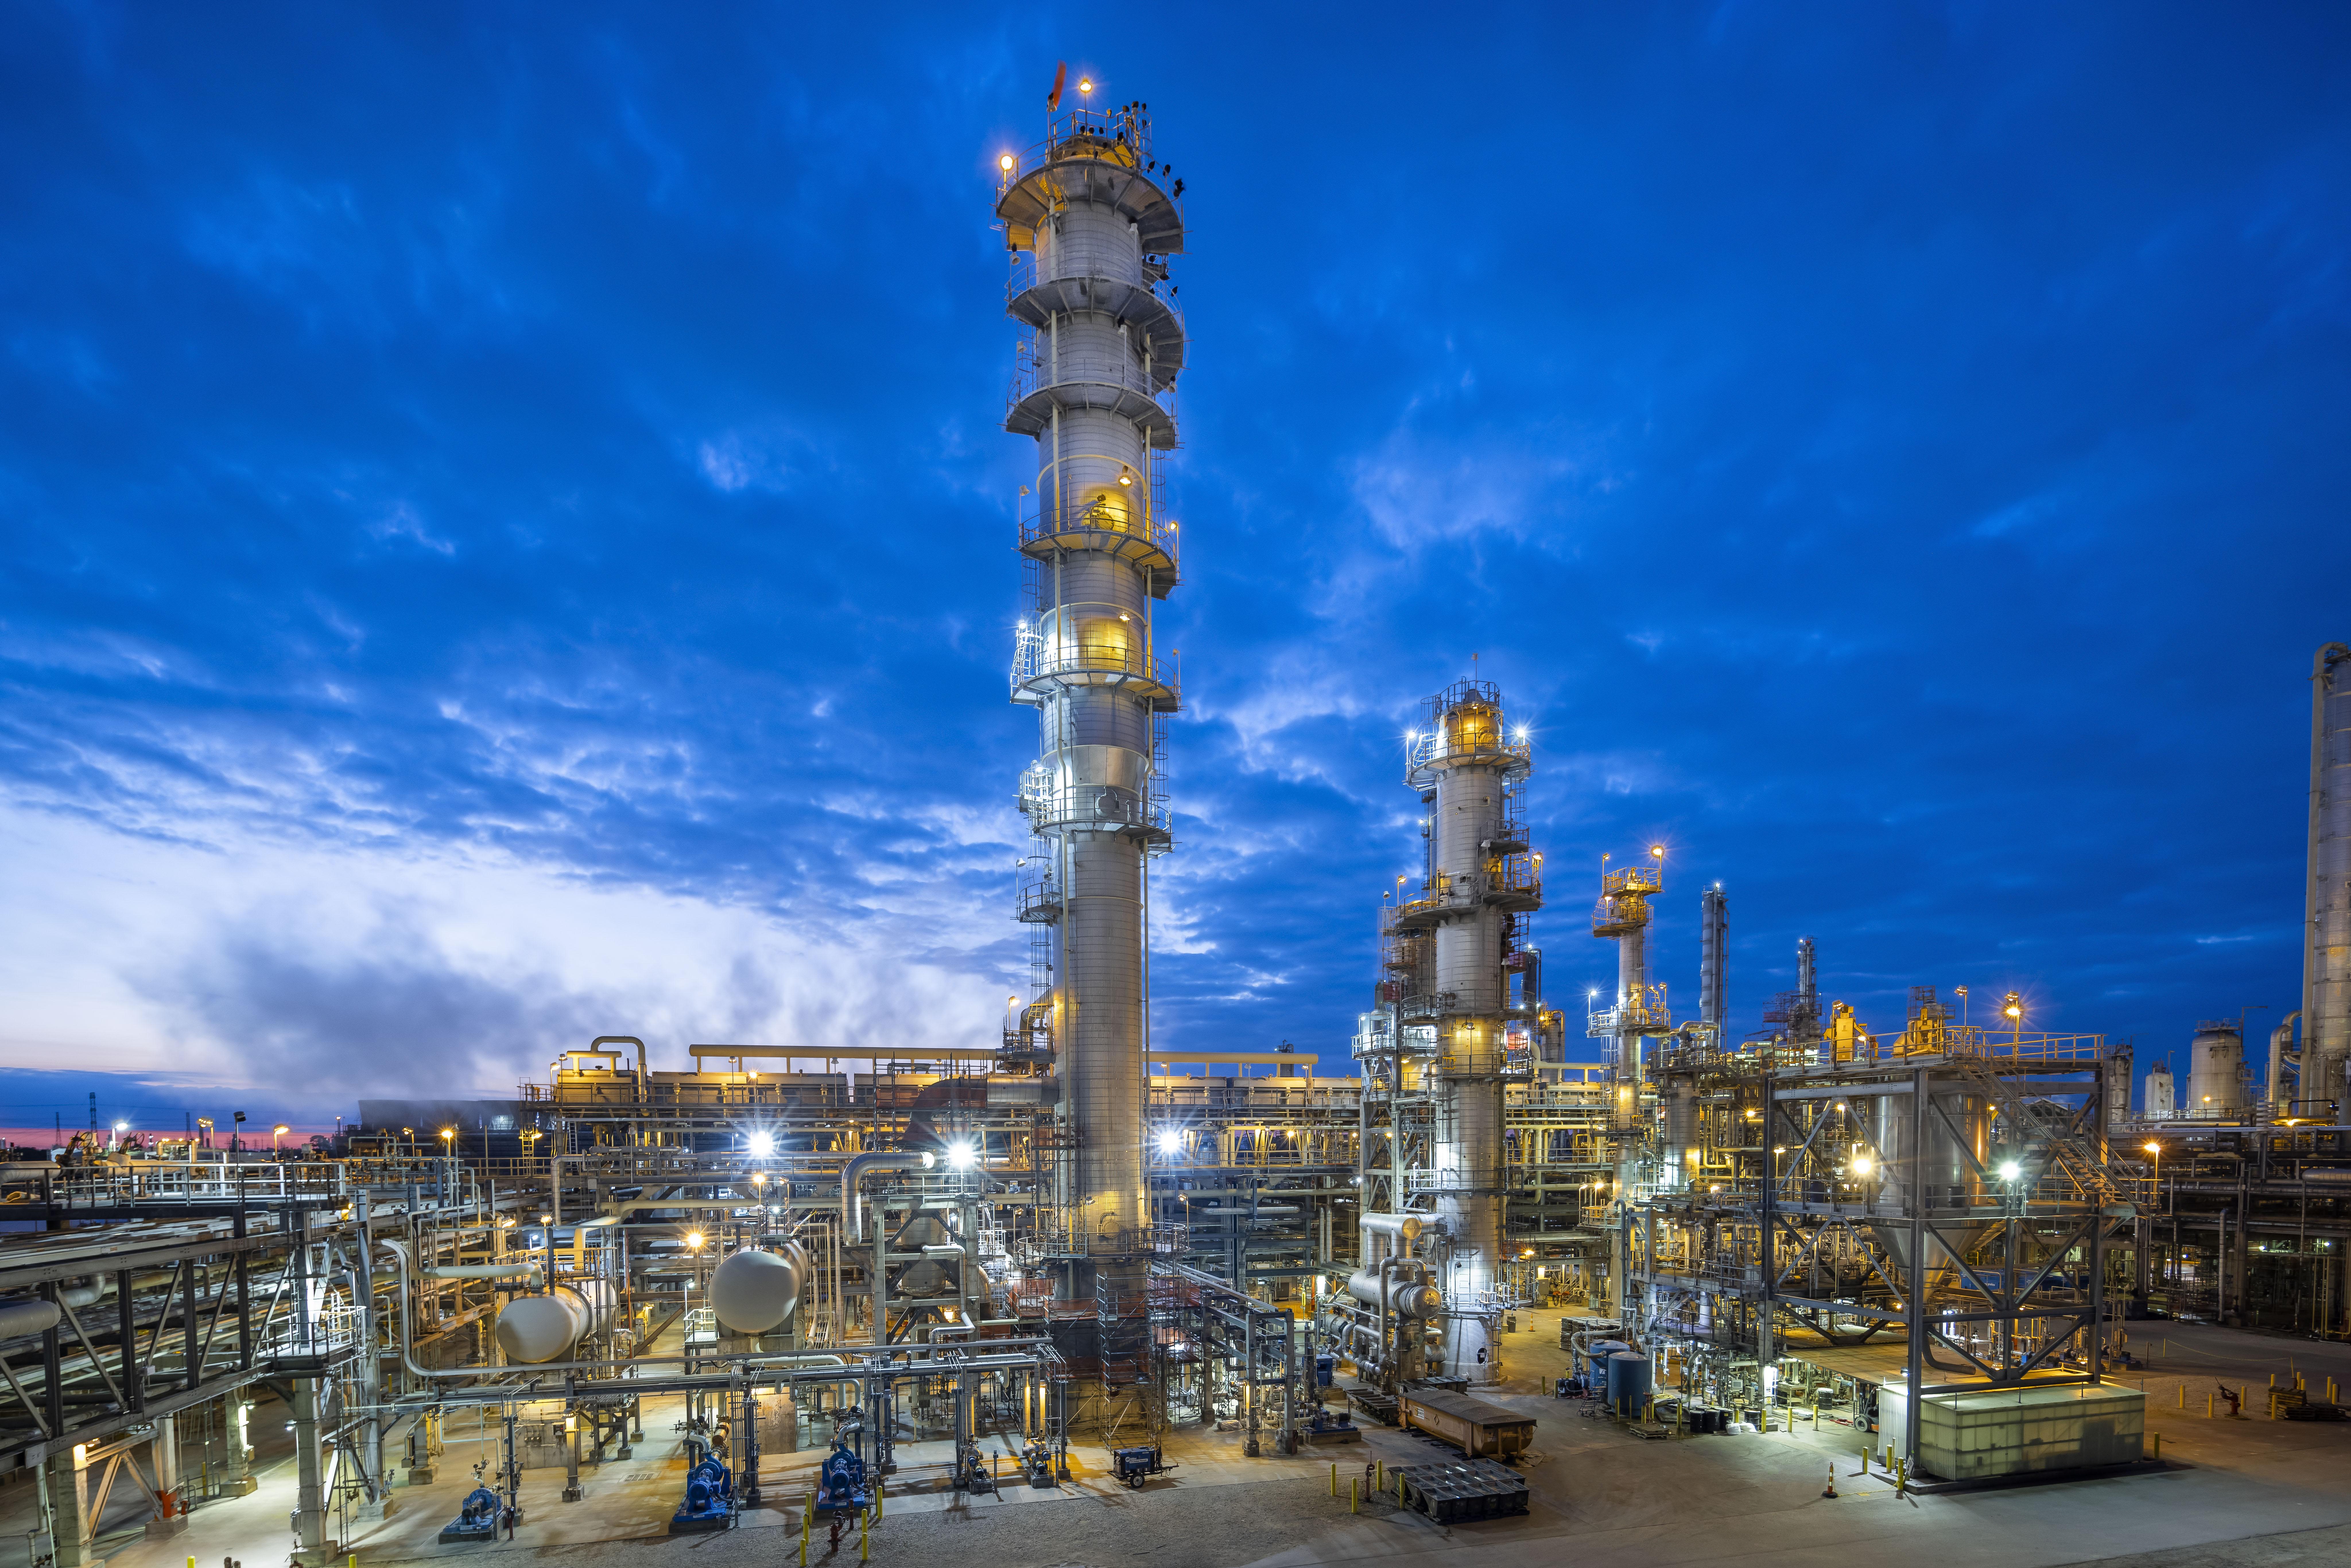 Chevron Phillips Chemical breaks ground on world-scale 1-hexene unit in Old Ocean, Texas